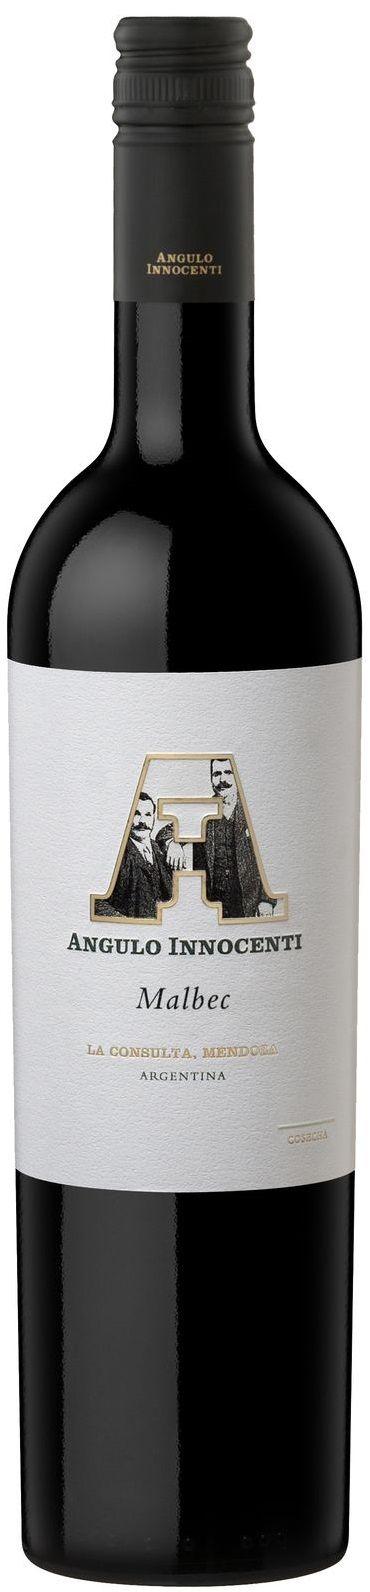 """Angulo Innocenti"" Malbec 2012 - Bodega Angulo Innocenti, San Carlos, Mendoza----------------------Terroir: La Consulta (San Carlos) --------- Crianza: 7 meses en barricas (50% del vino)"